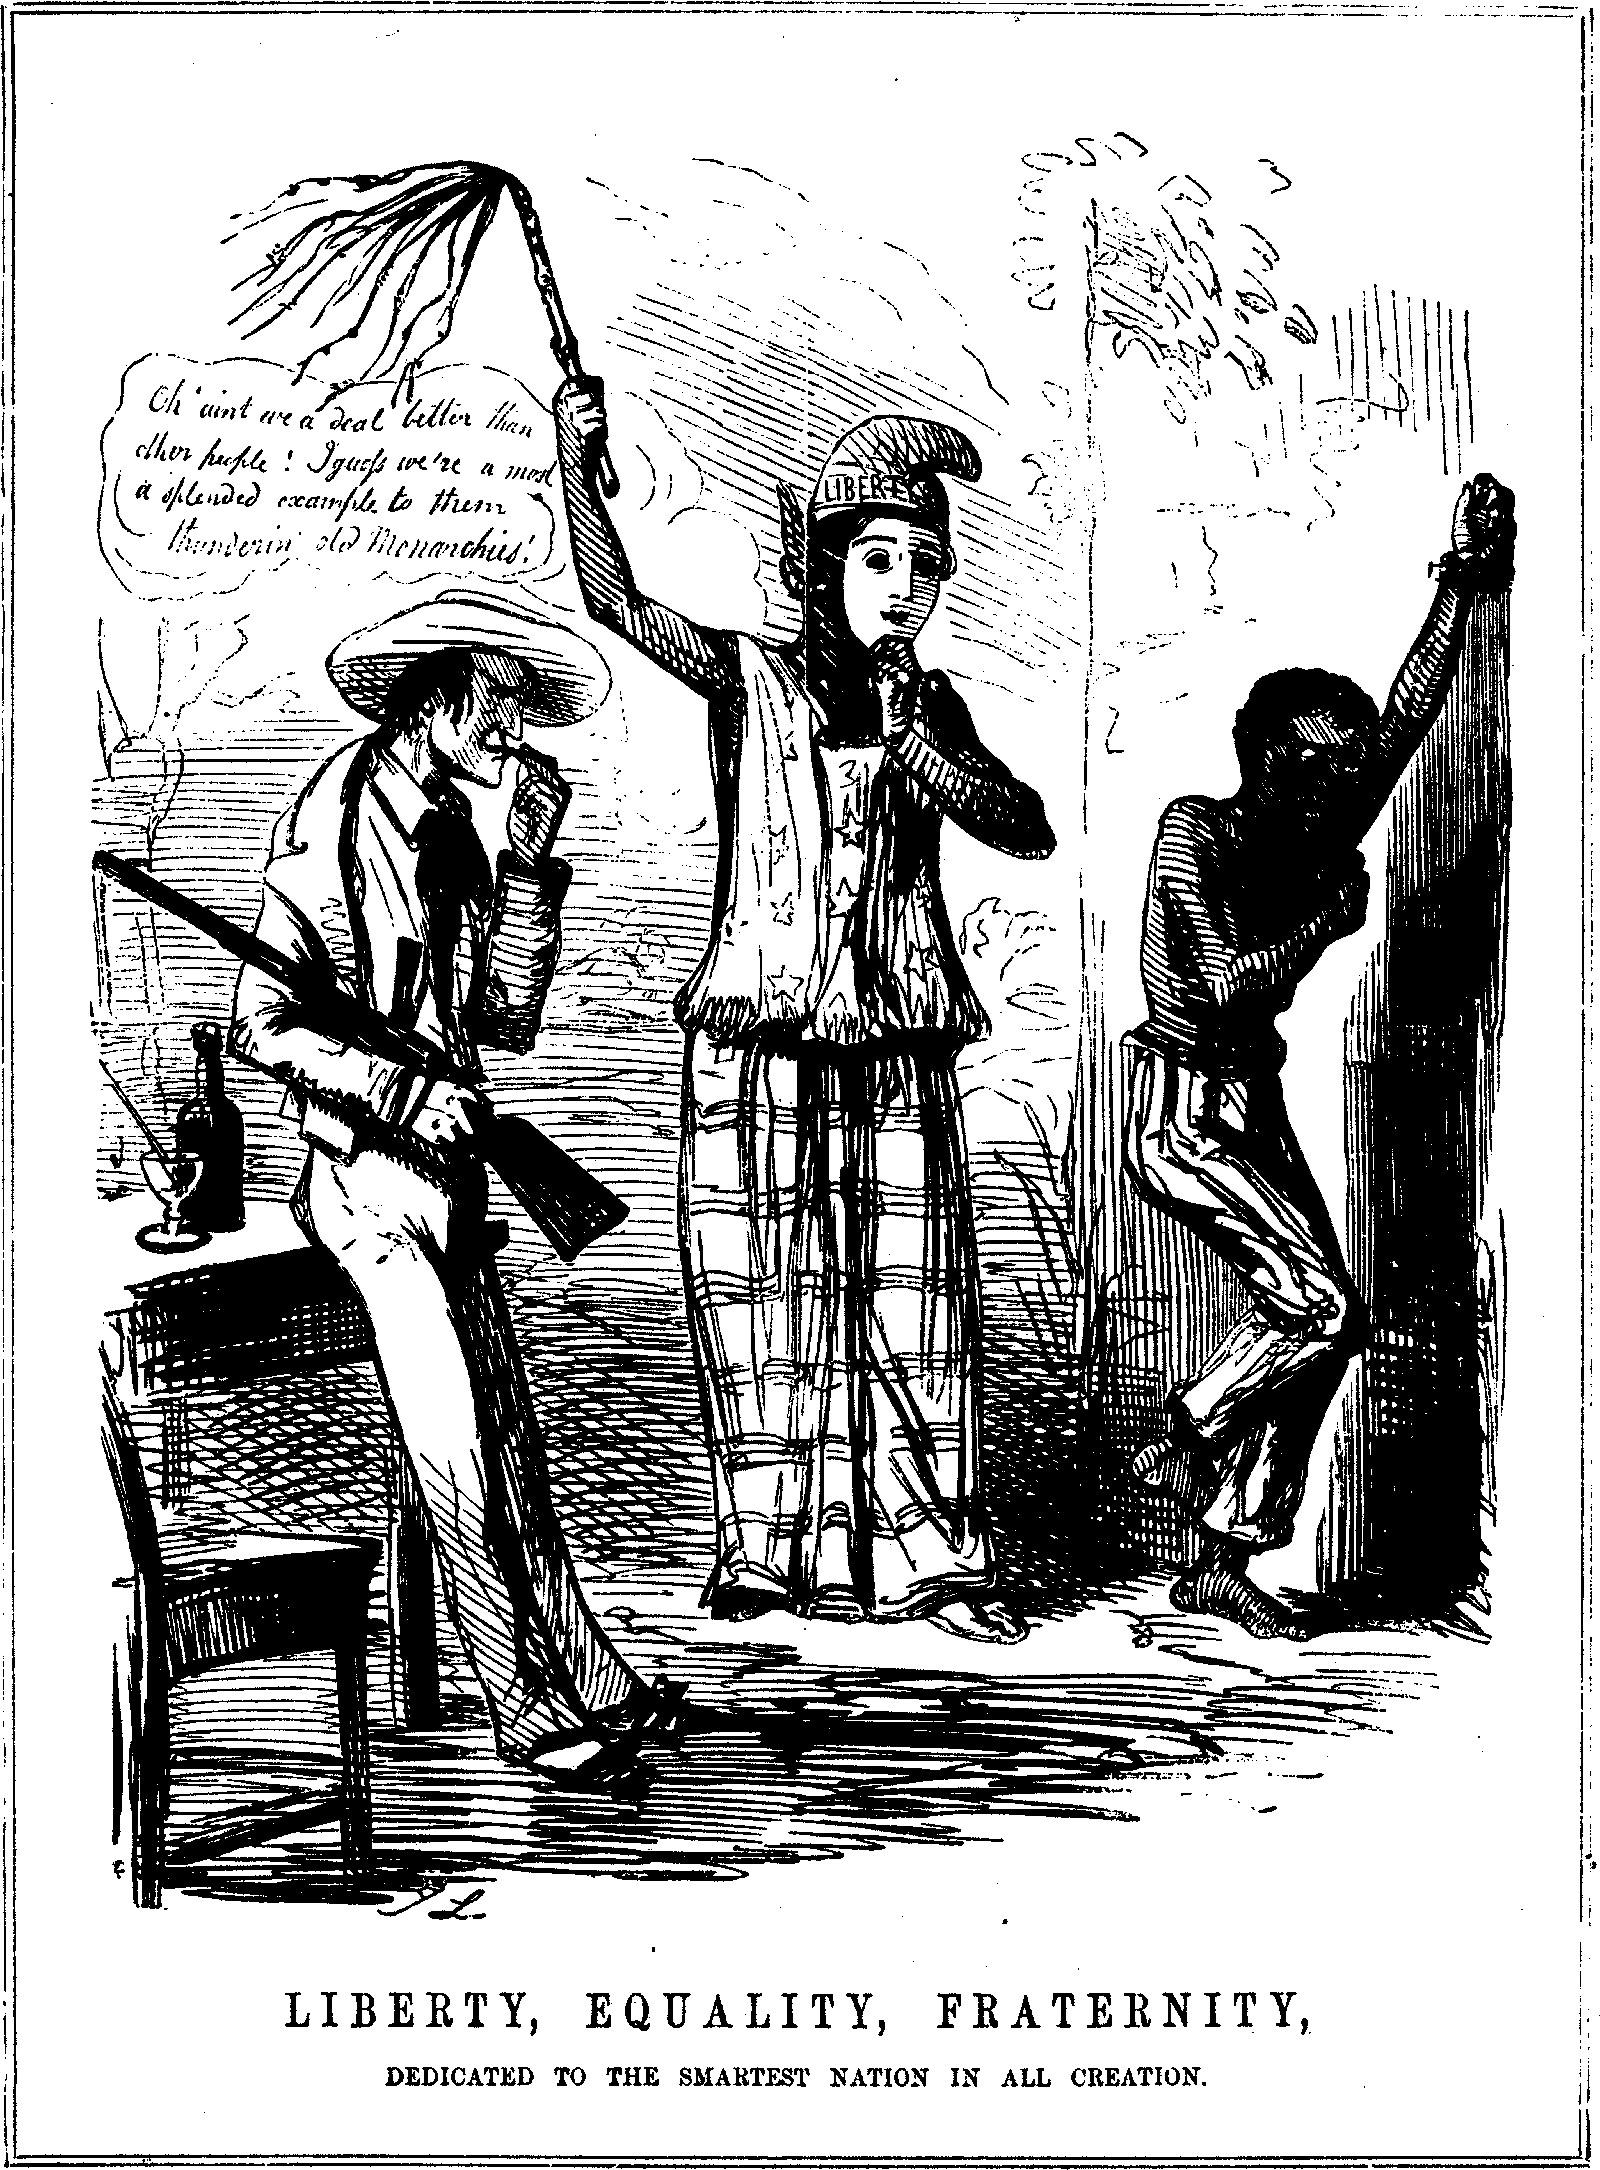 An English cartoon by John Leech satirizing the hypocrisy of proslavery Americans, 1848